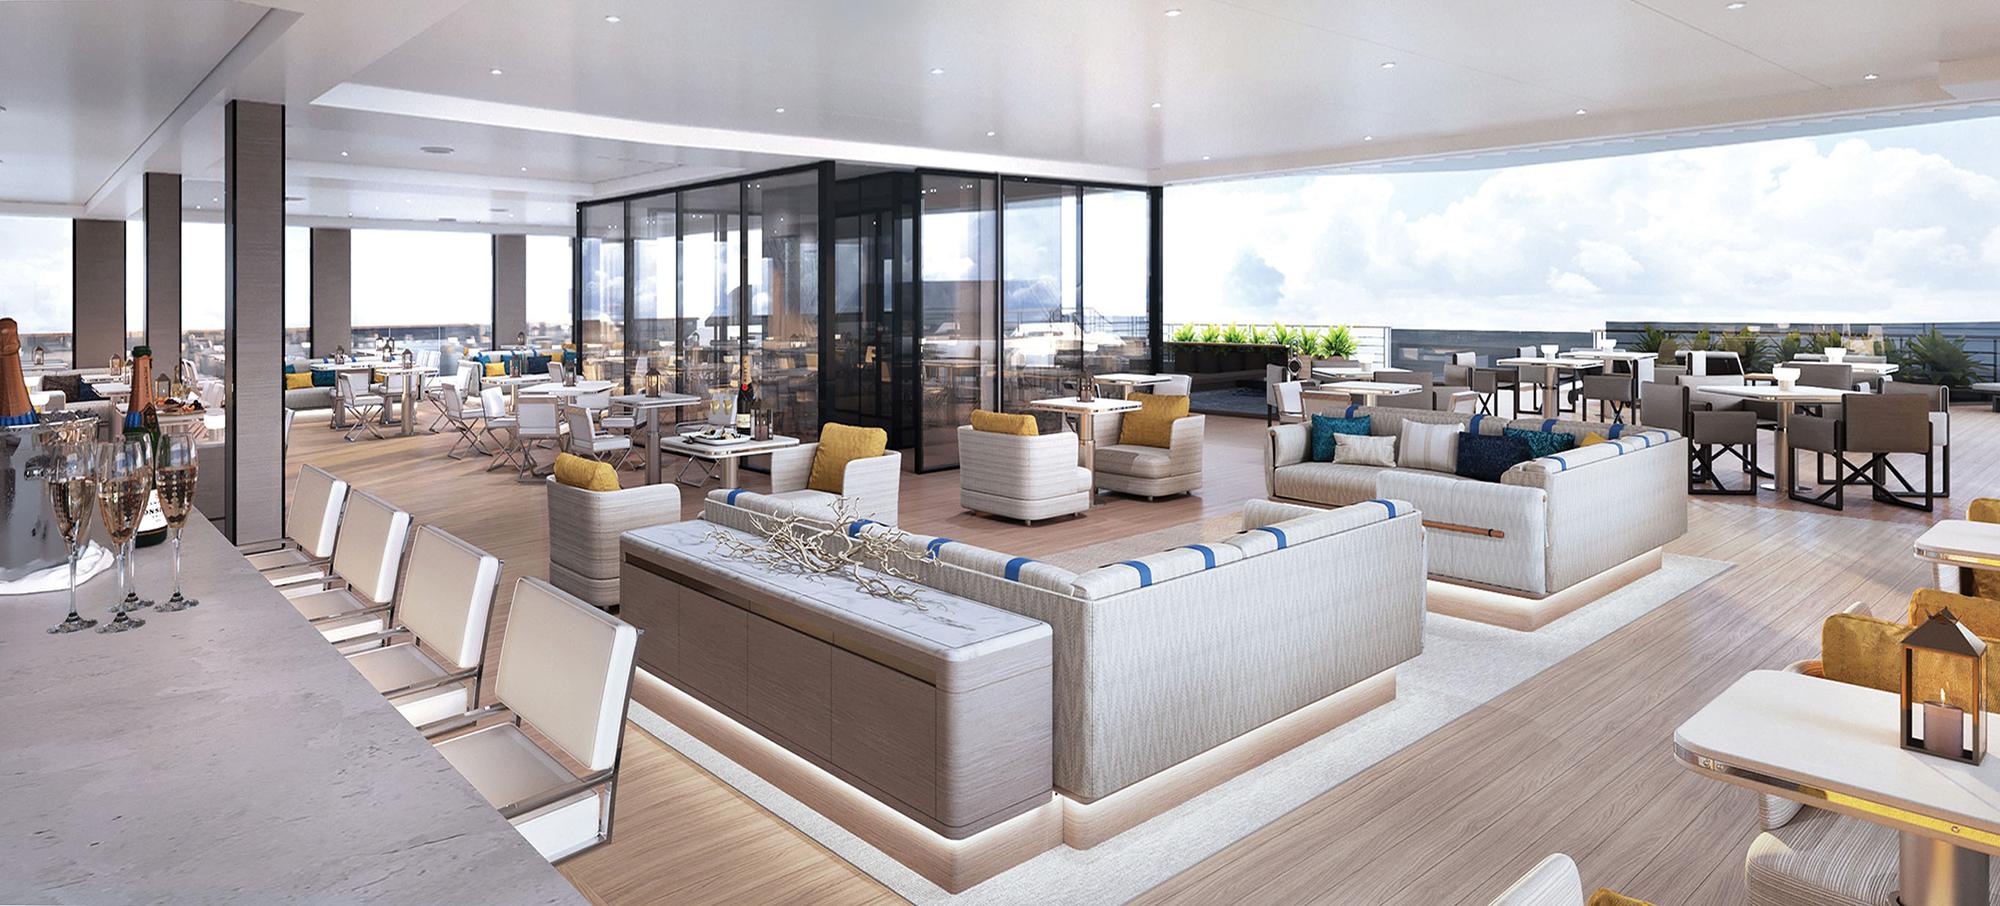 Marina Lounge (The Ritz-Carlton Yacht Collection)